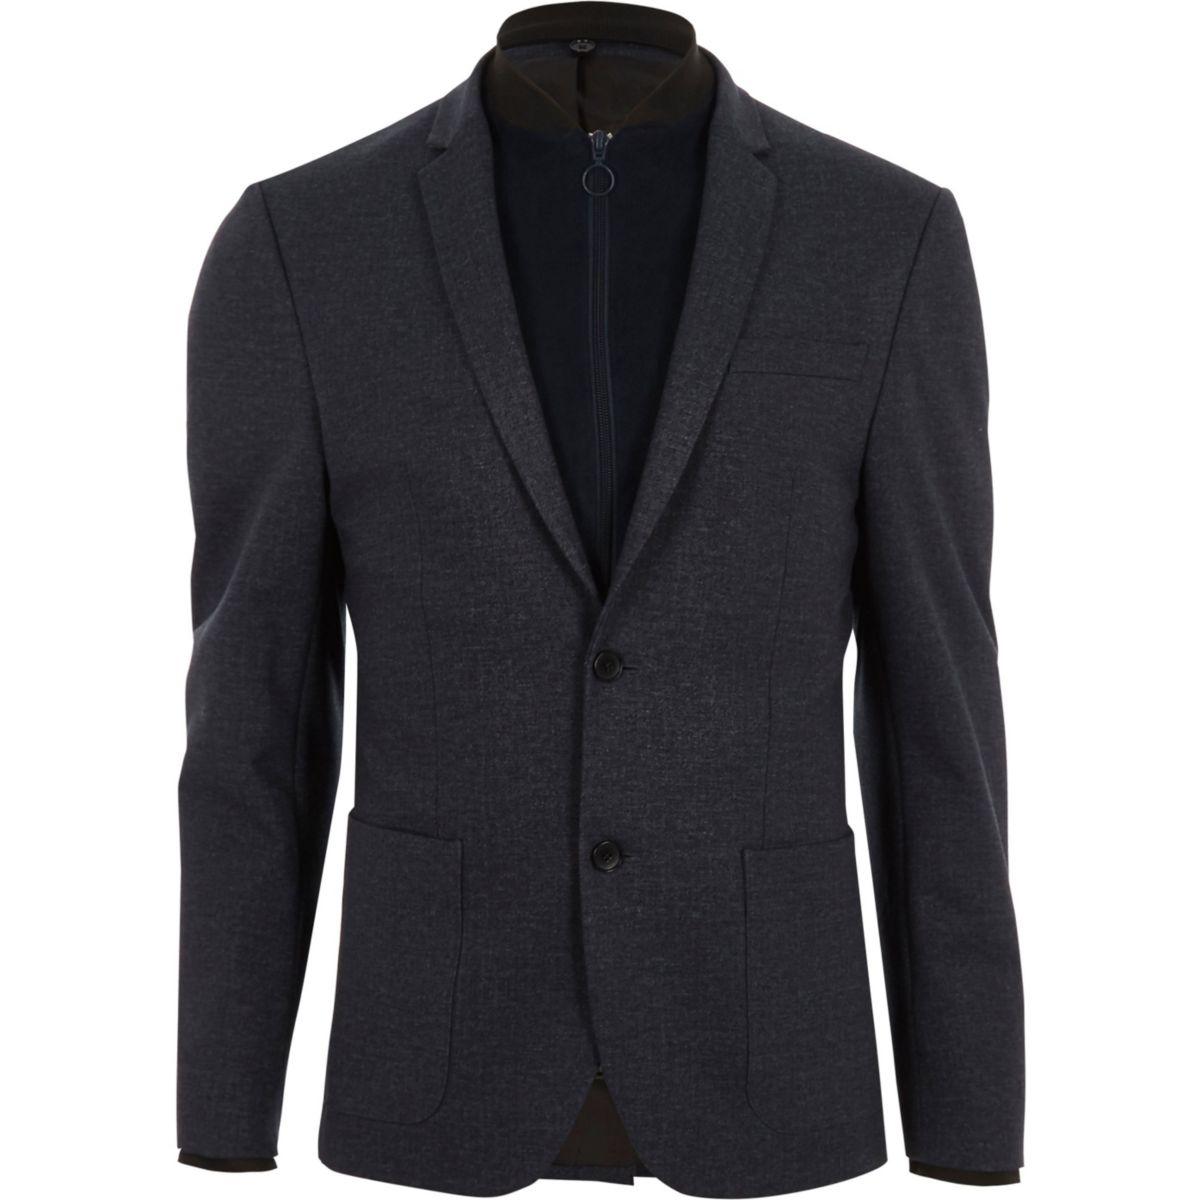 blazer skinny bleu marine avec empi cements fa on blouson blazers promos homme. Black Bedroom Furniture Sets. Home Design Ideas